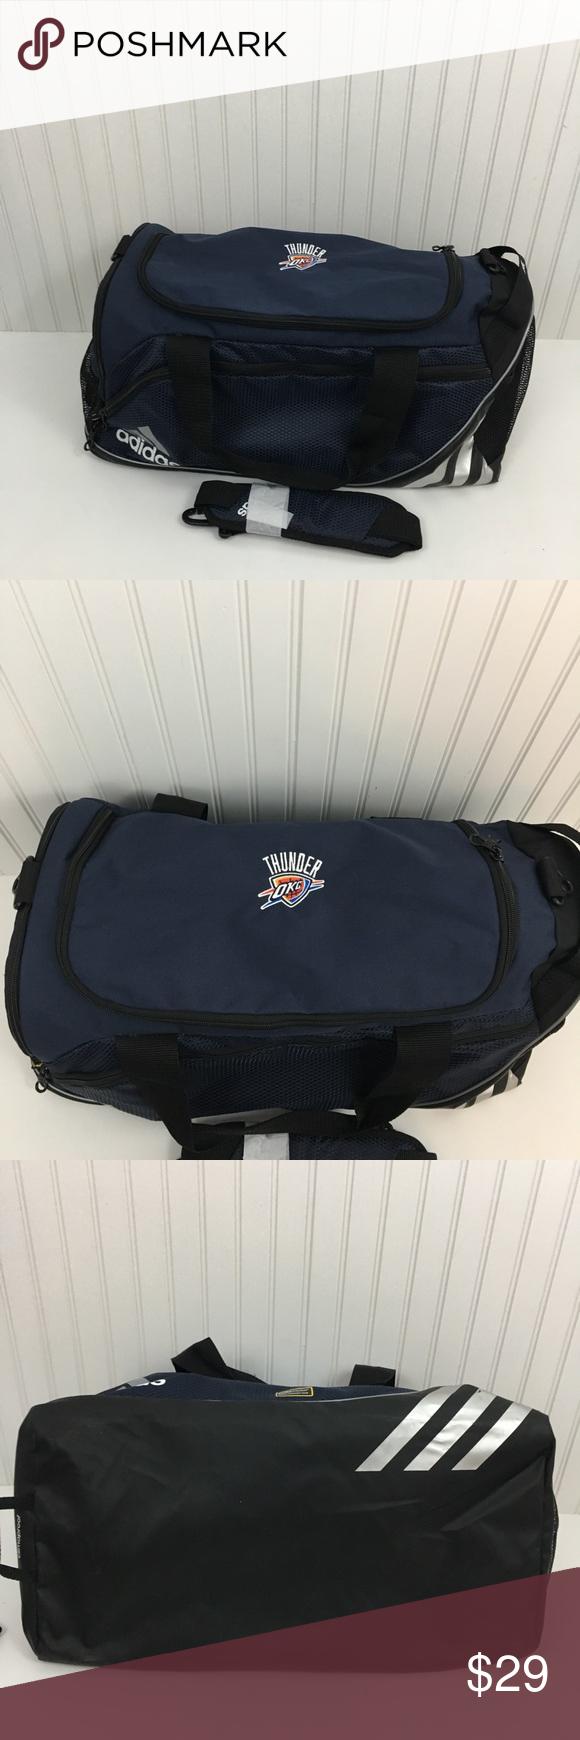 c3ee2cd74fb9 Adidas team issue duffel bag Okc thunder